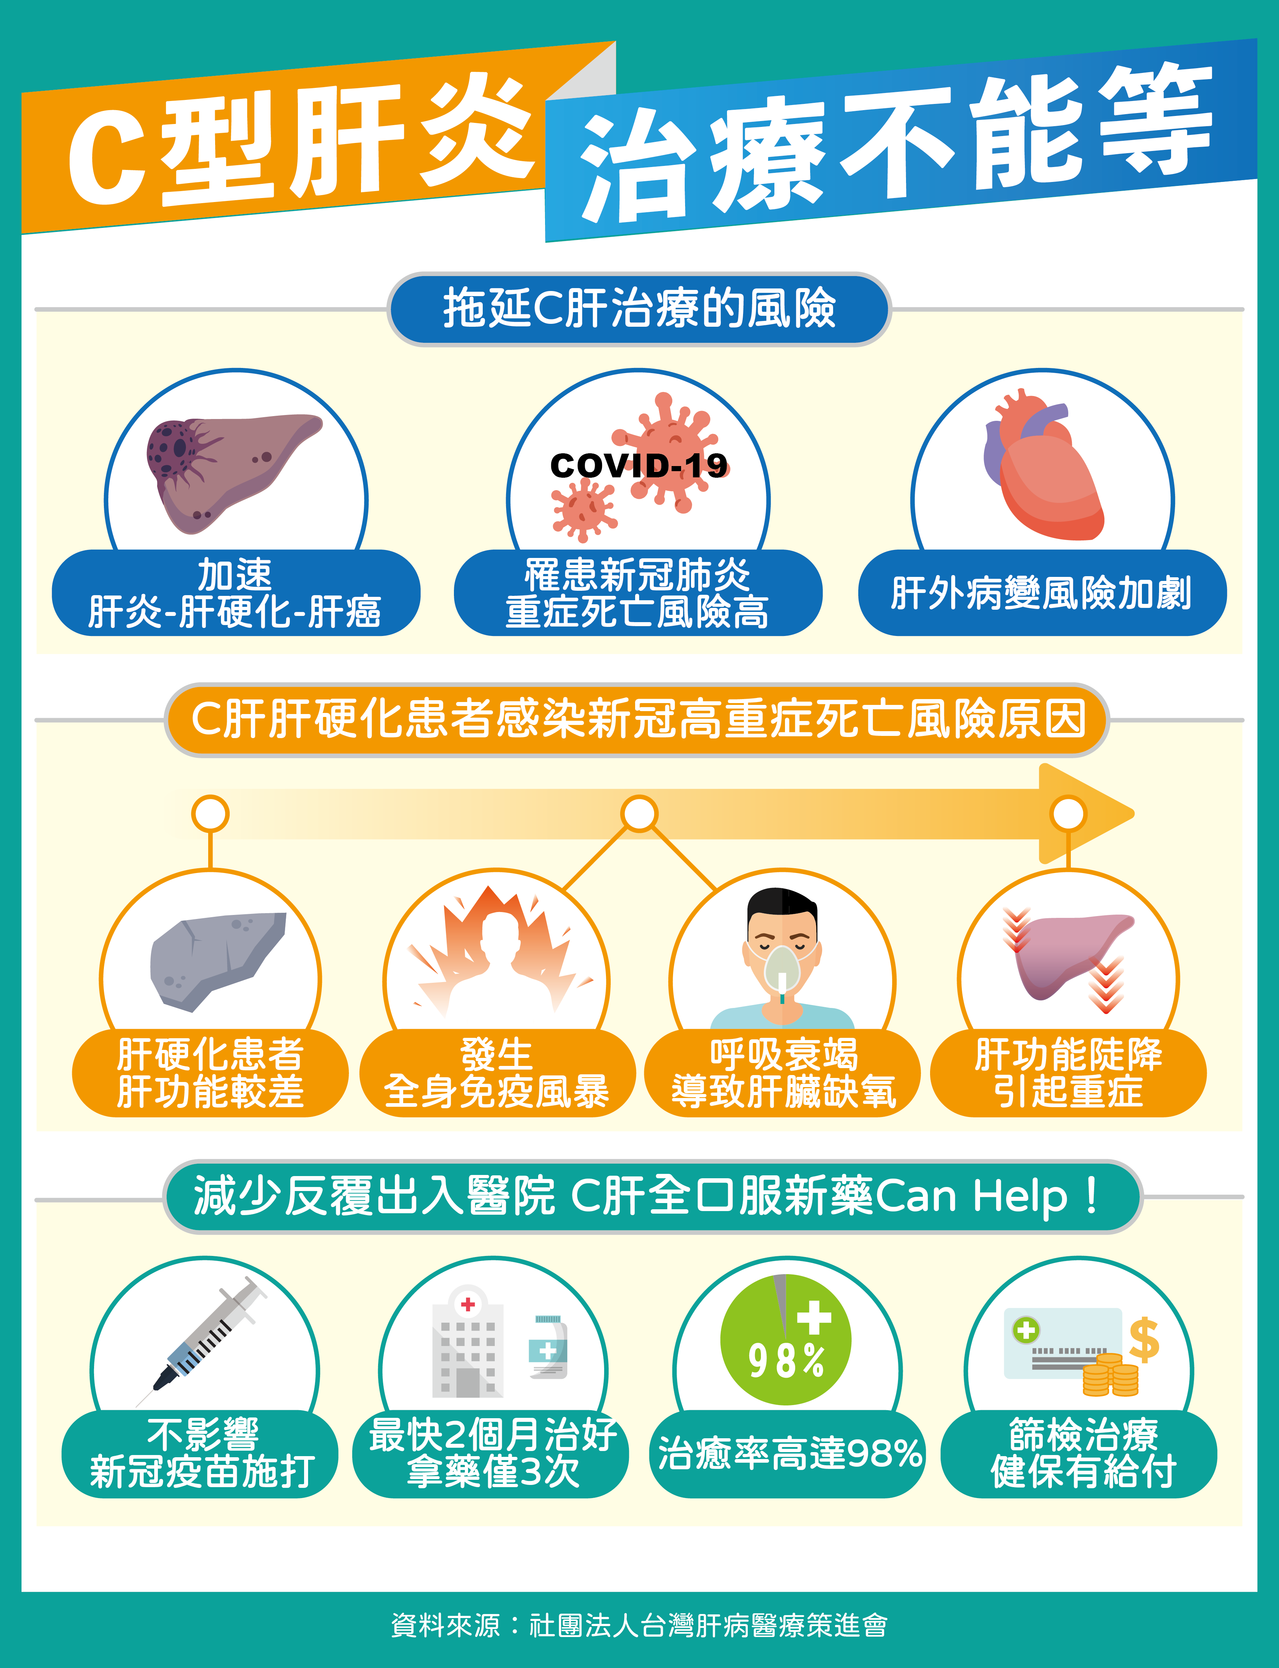 C肝患者疫情治療打對折 肝硬化確診死亡風險超出3倍